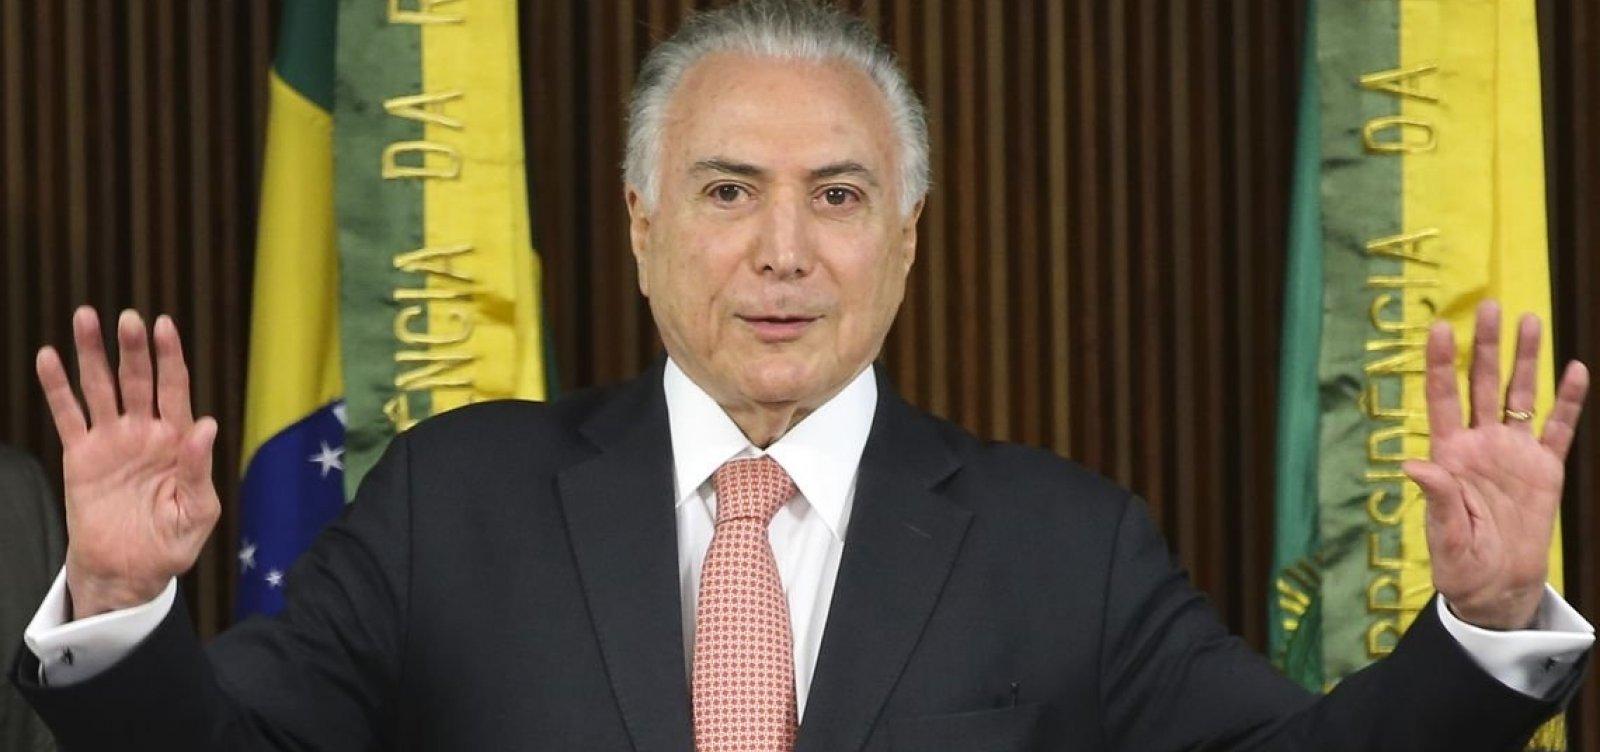 Ministro do STJ se declara impedido para julgar liberdade de Temer